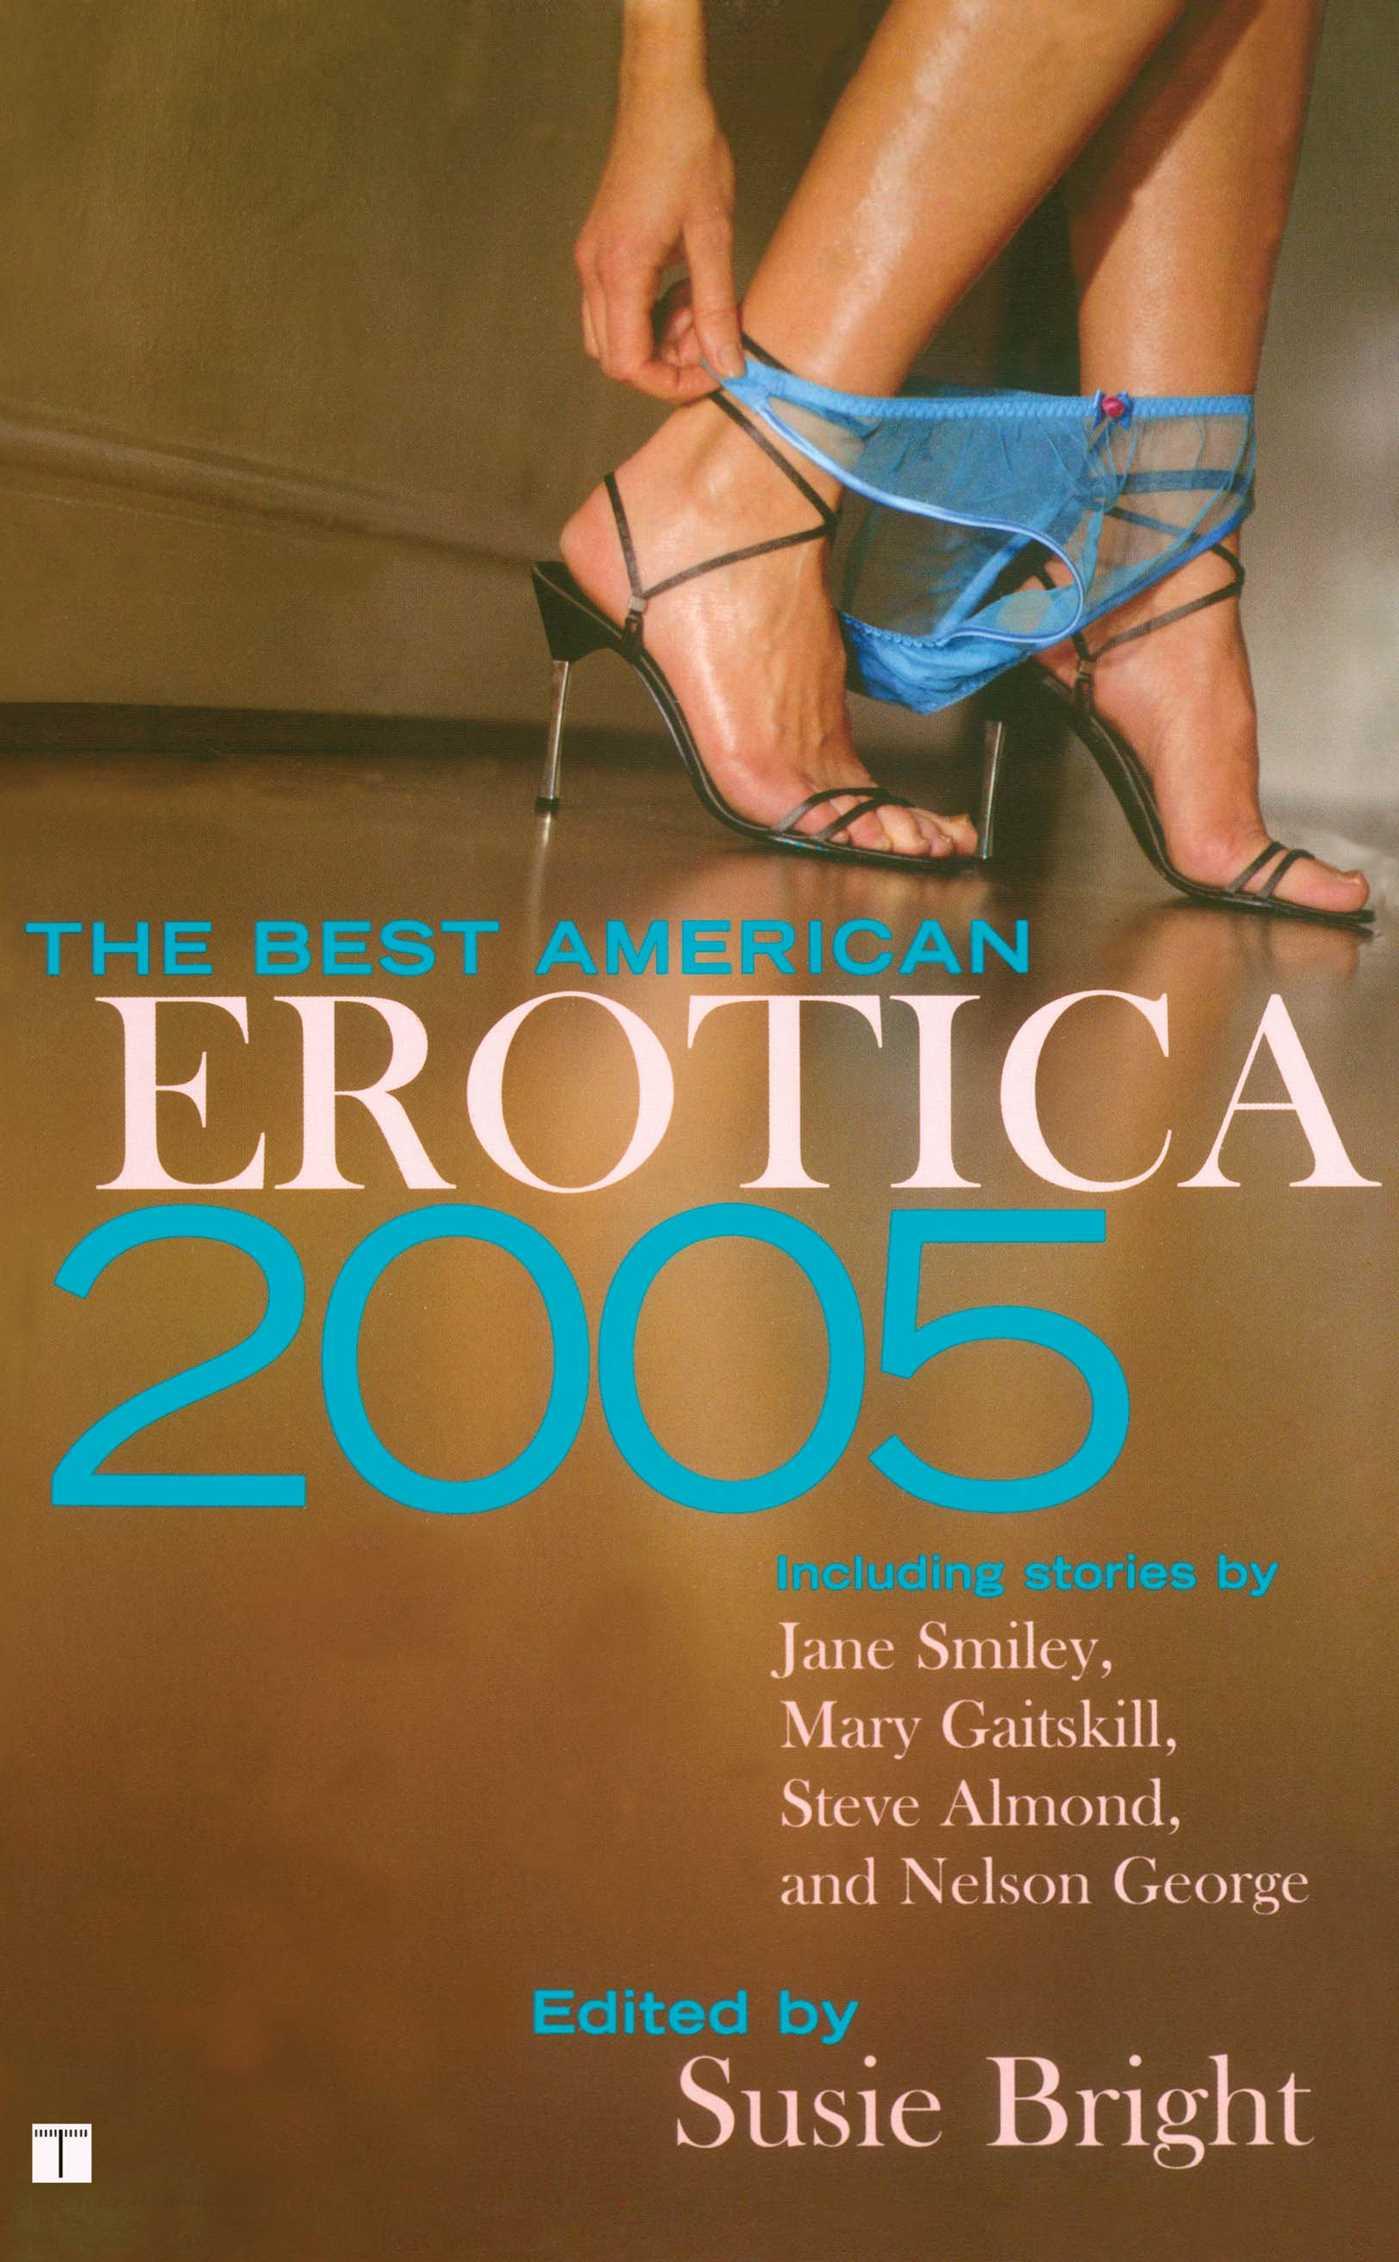 American erotic stories final